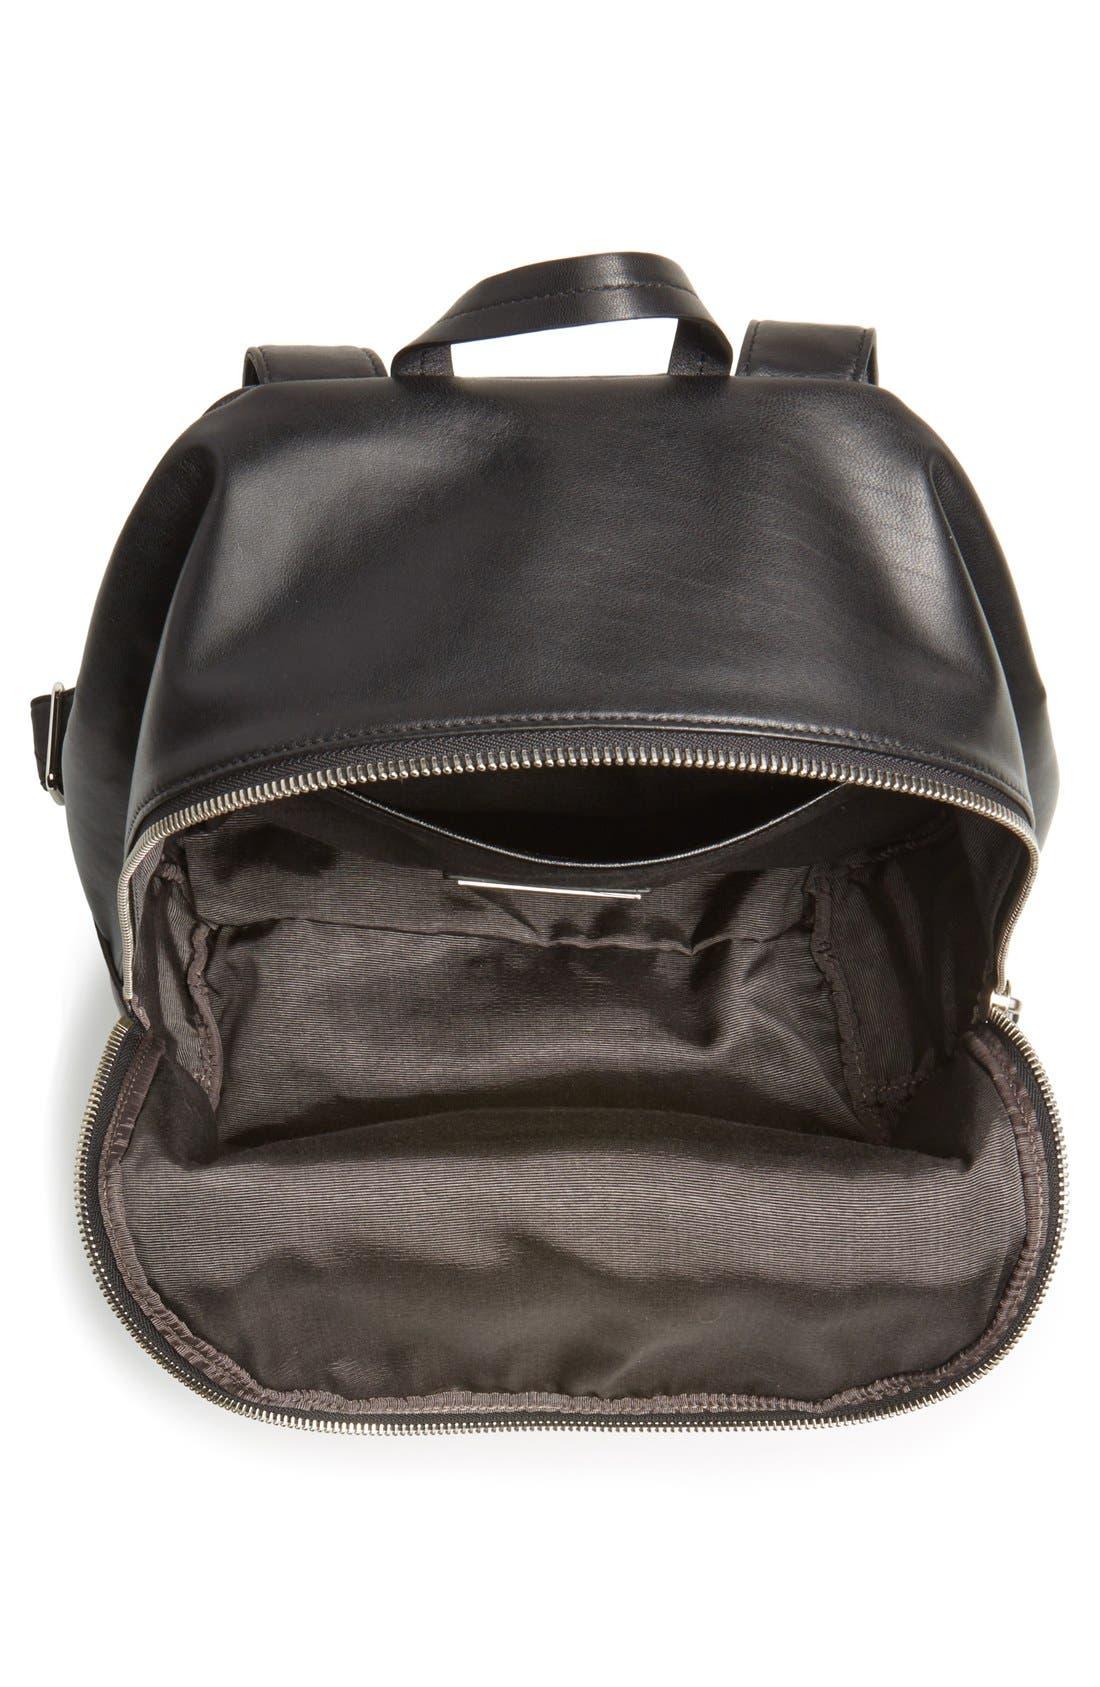 Alternate Image 3  - Elizabeth and James 'Cynnie' Lizard Embossed Leather Backpack